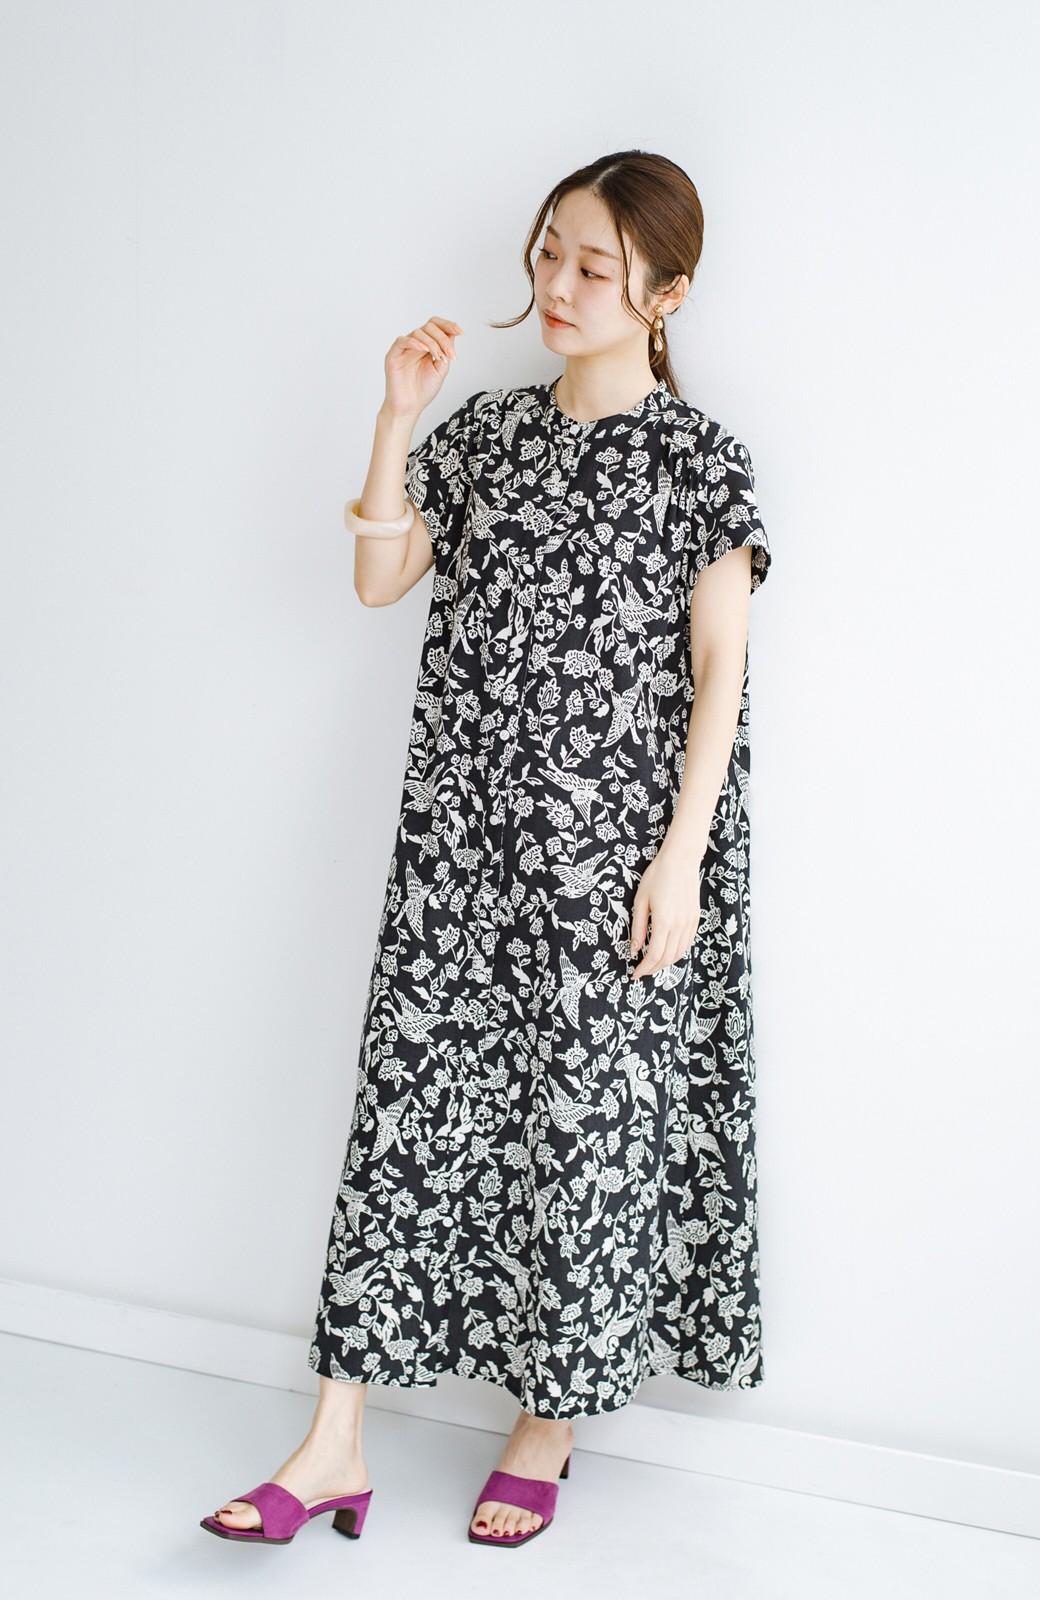 haco! 京都の浴衣屋さんと作った浴衣生地の羽織ってもかわいいロングワンピース <ブラック系その他>の商品写真9